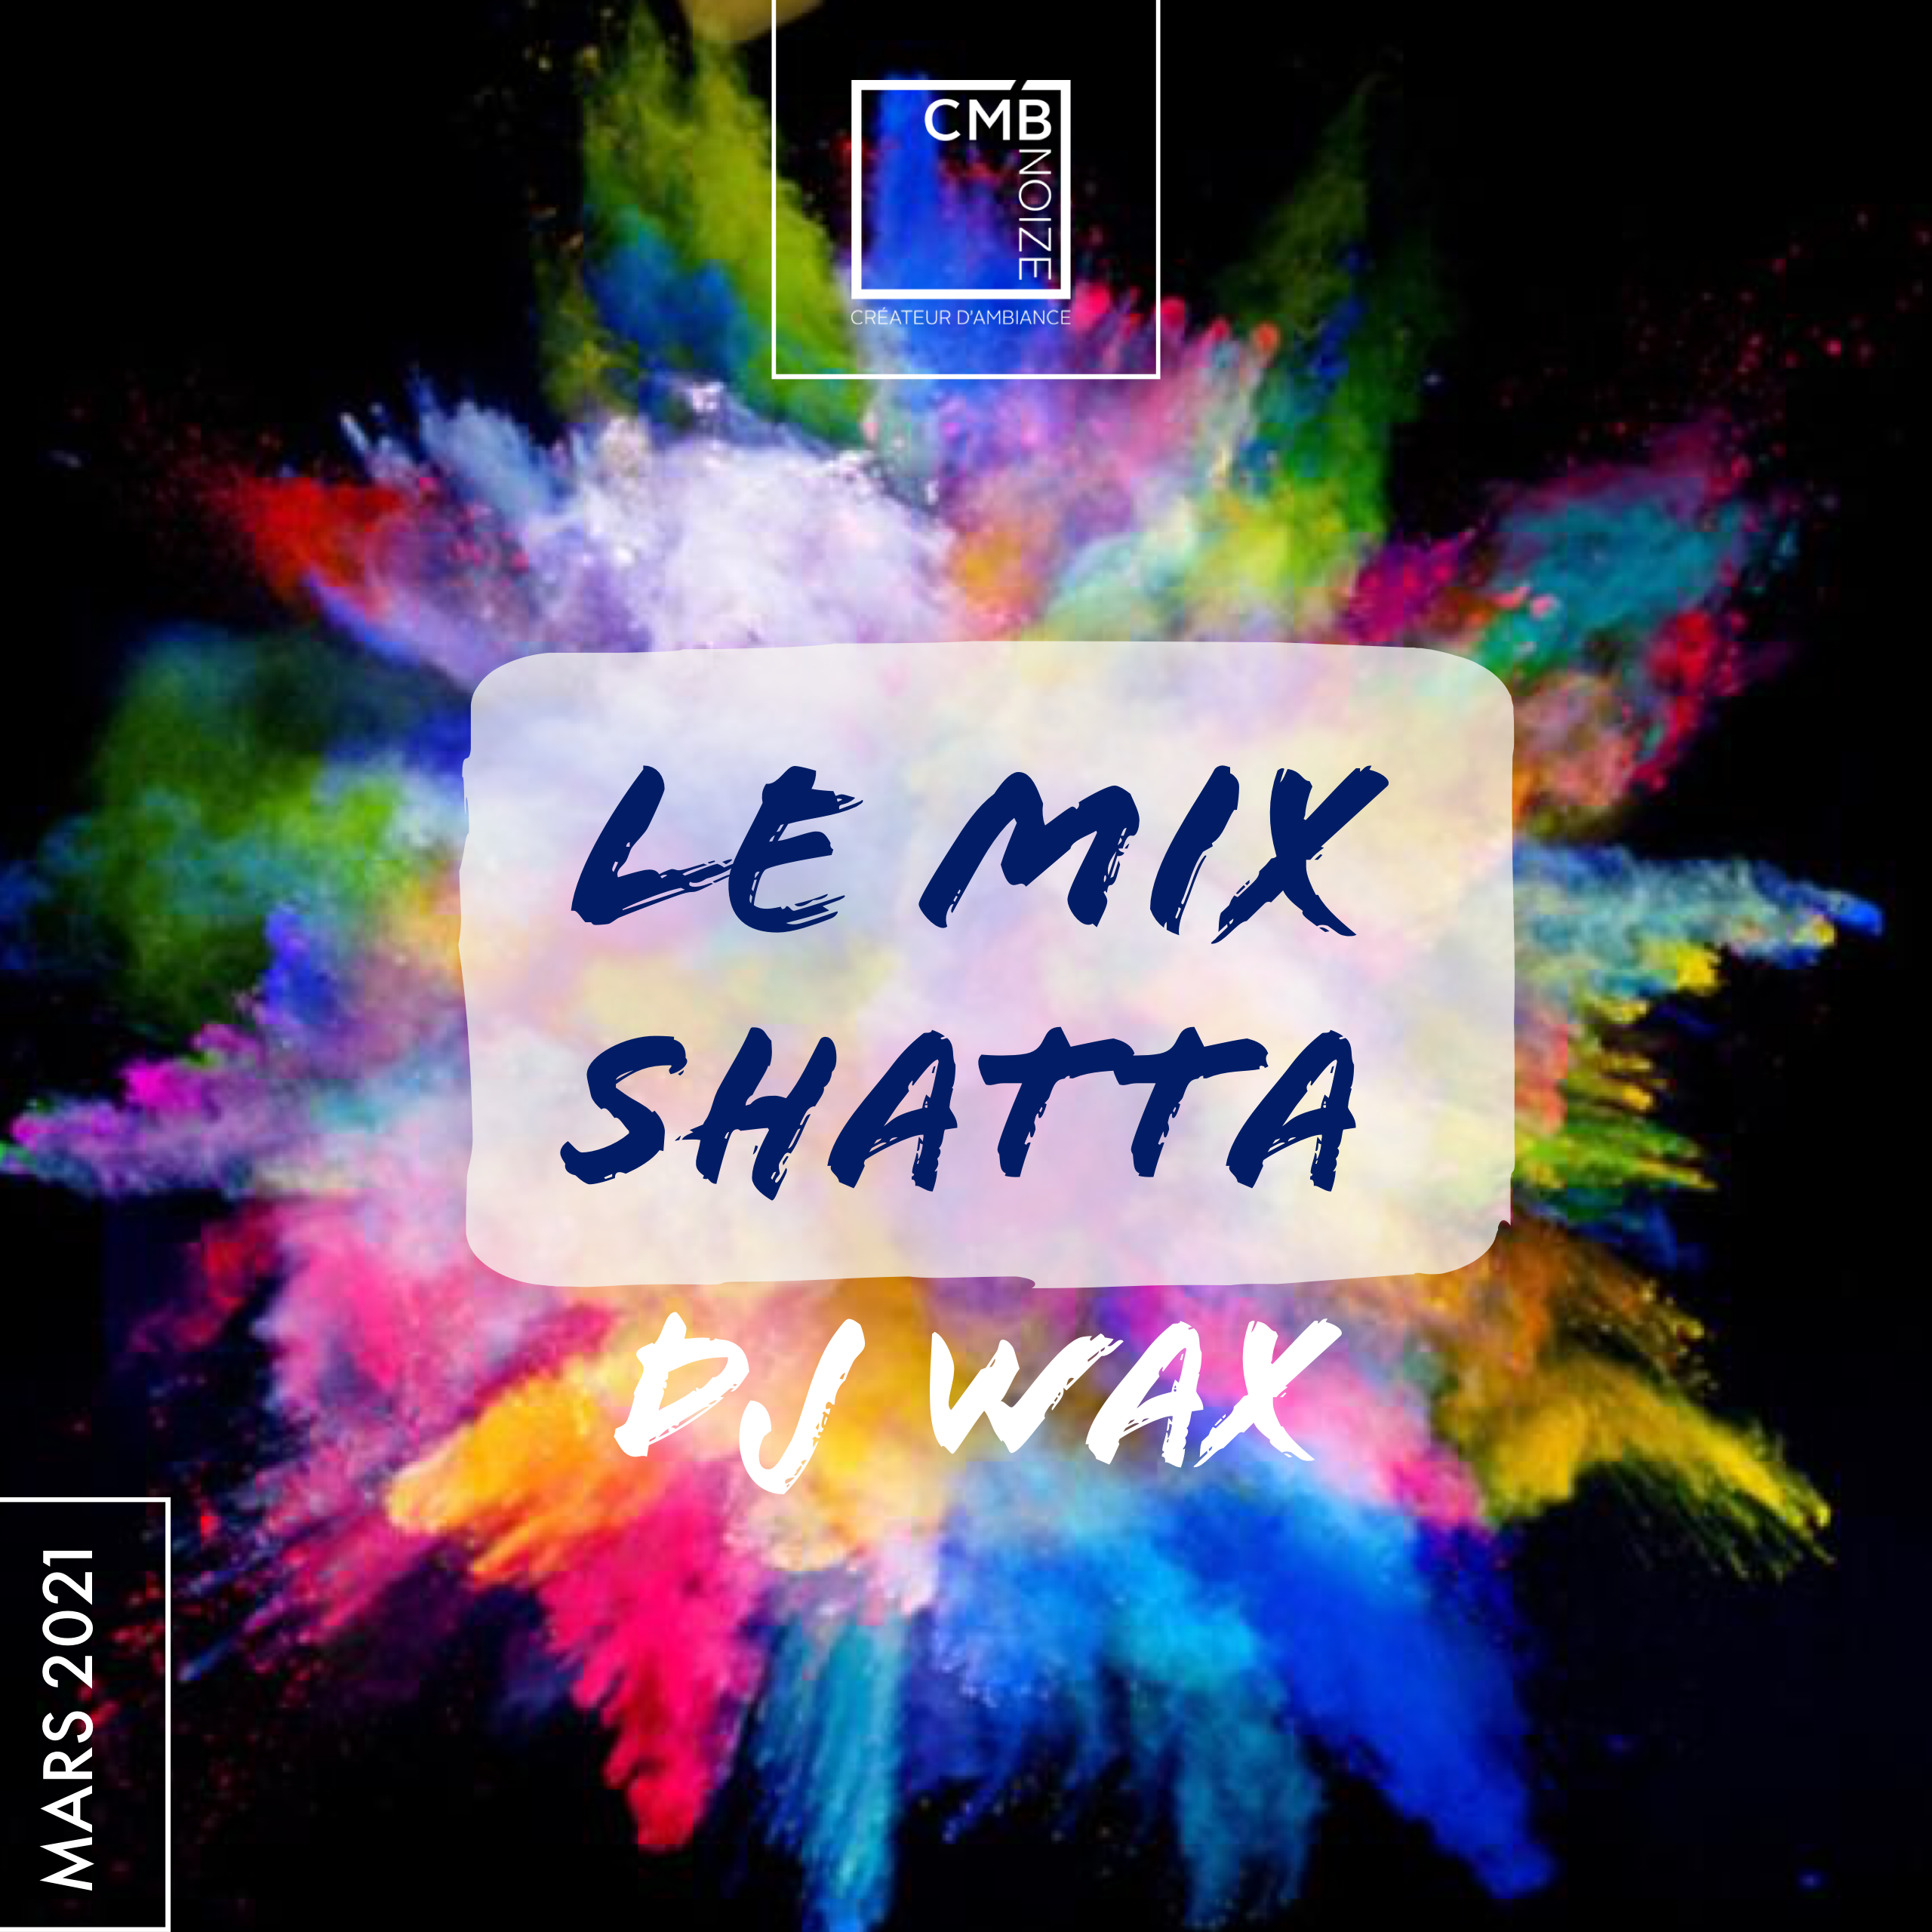 LE MIX SHATTA MARS 2021 - DJ WAX